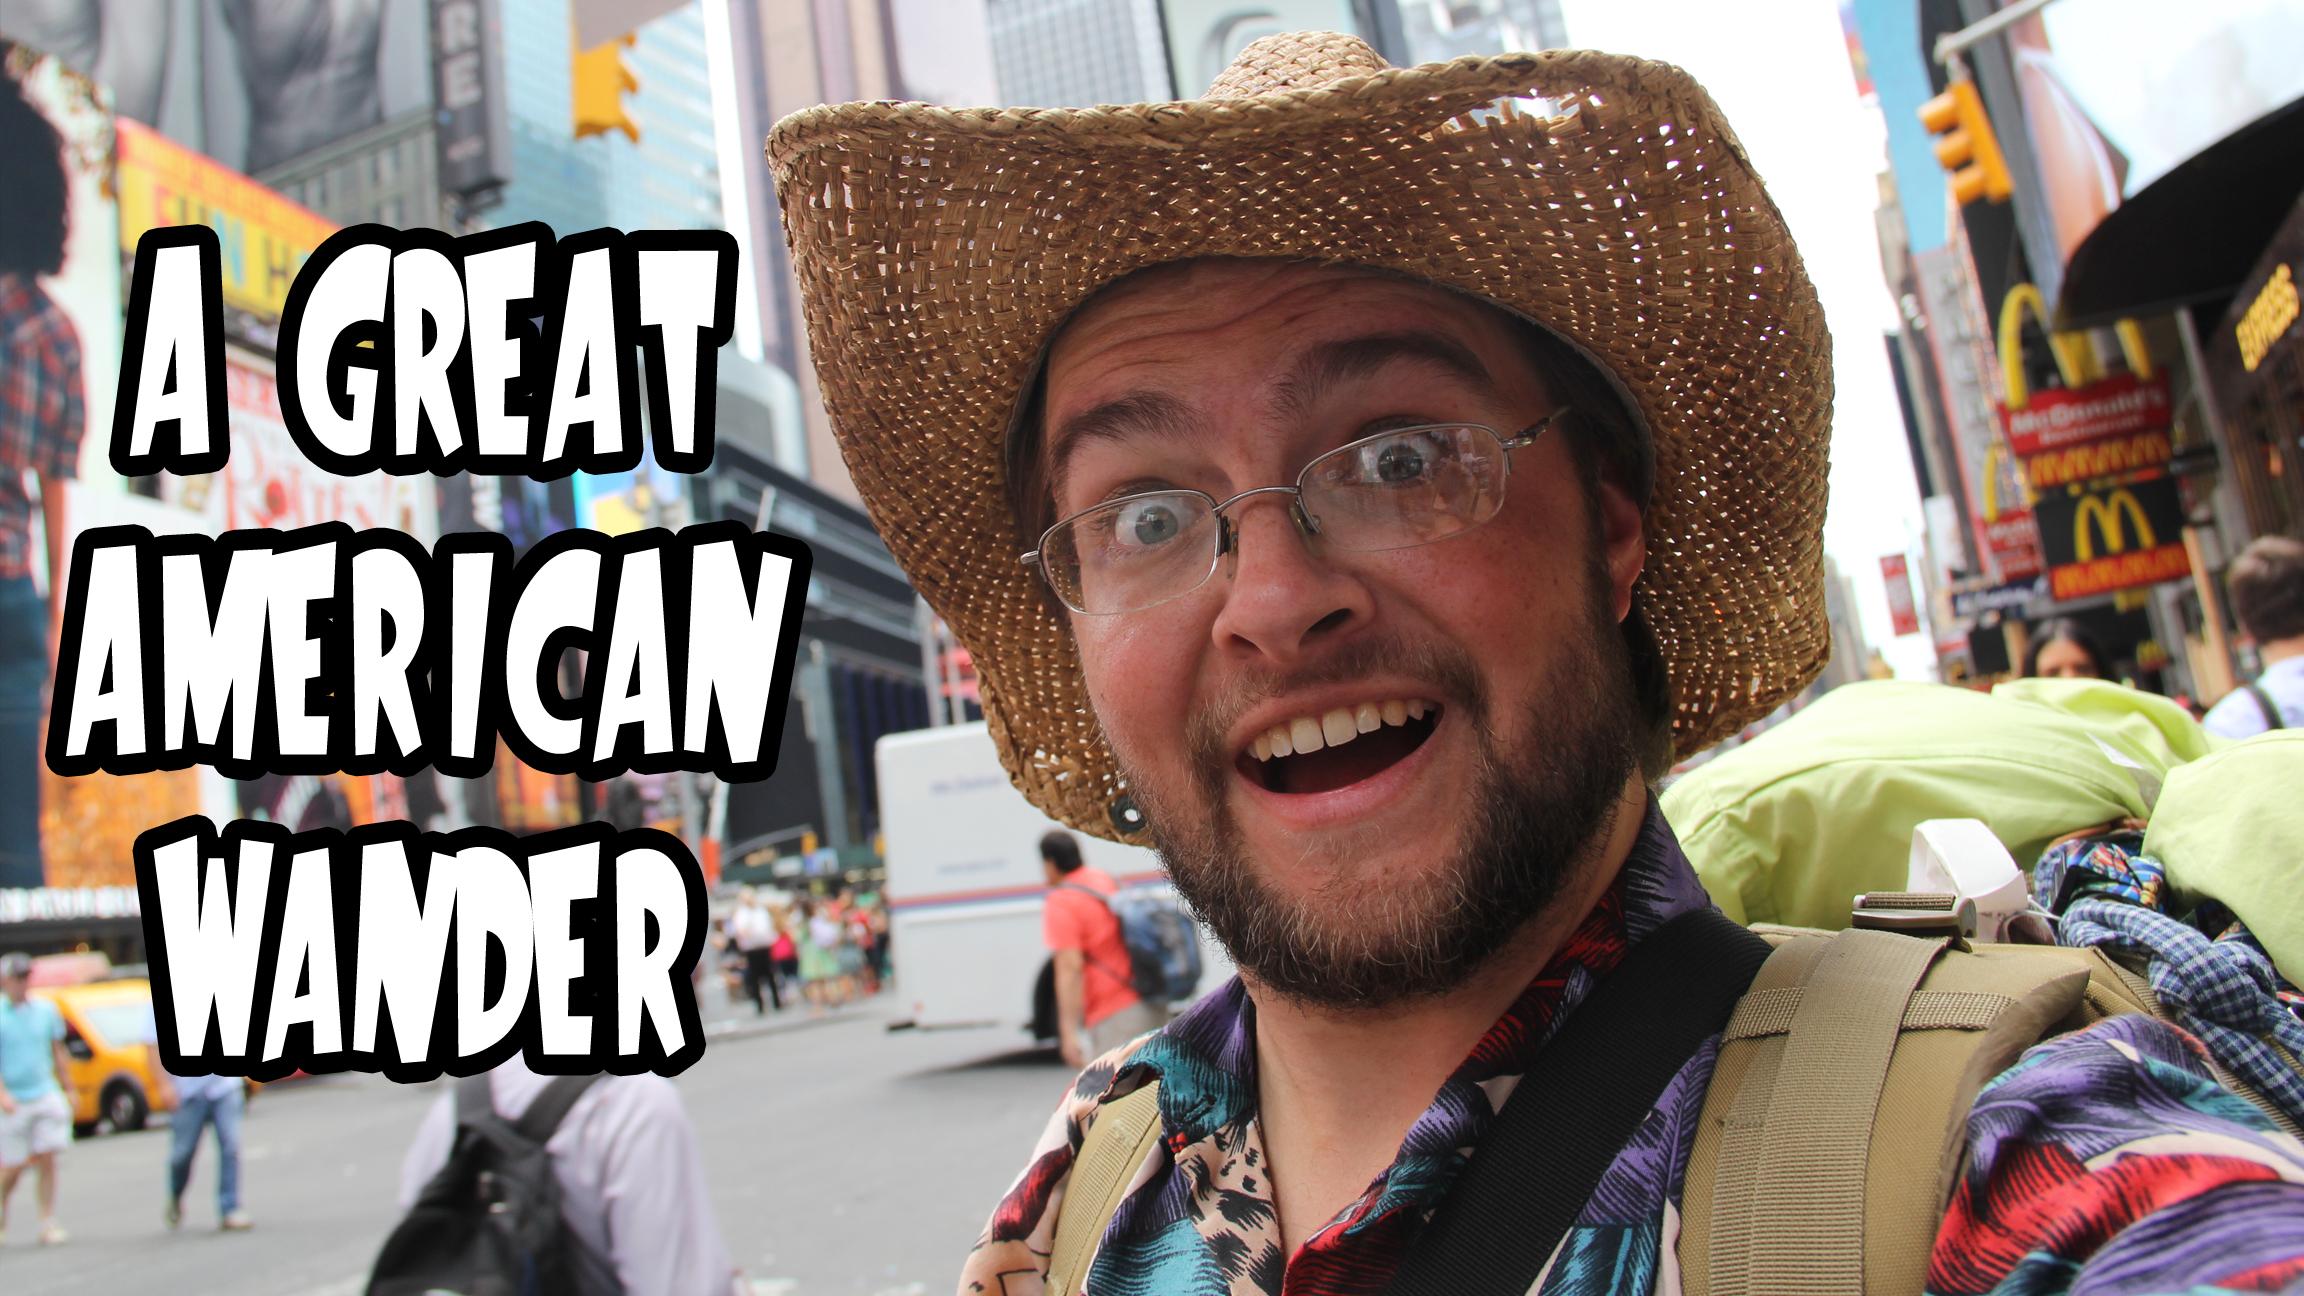 2015-08-22 A Great American Wander - My Journey So Far 3